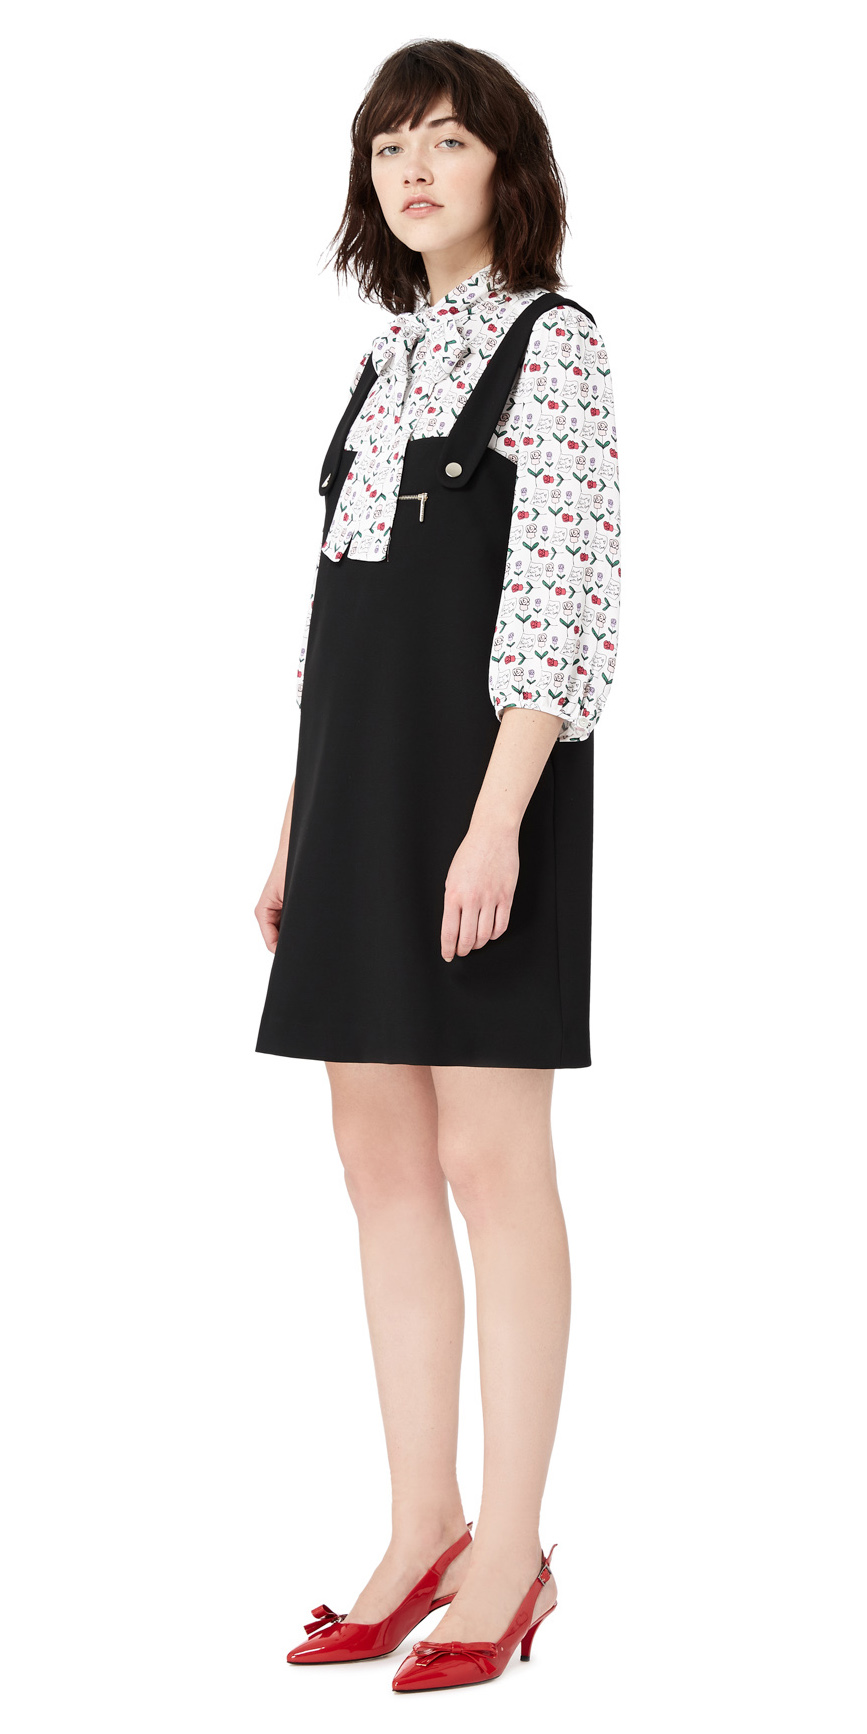 black-dress-jumper-red-shoe-pumps-slingbacks-print-white-top-blouse-brun-layer-fall-winter-lunch.jpg